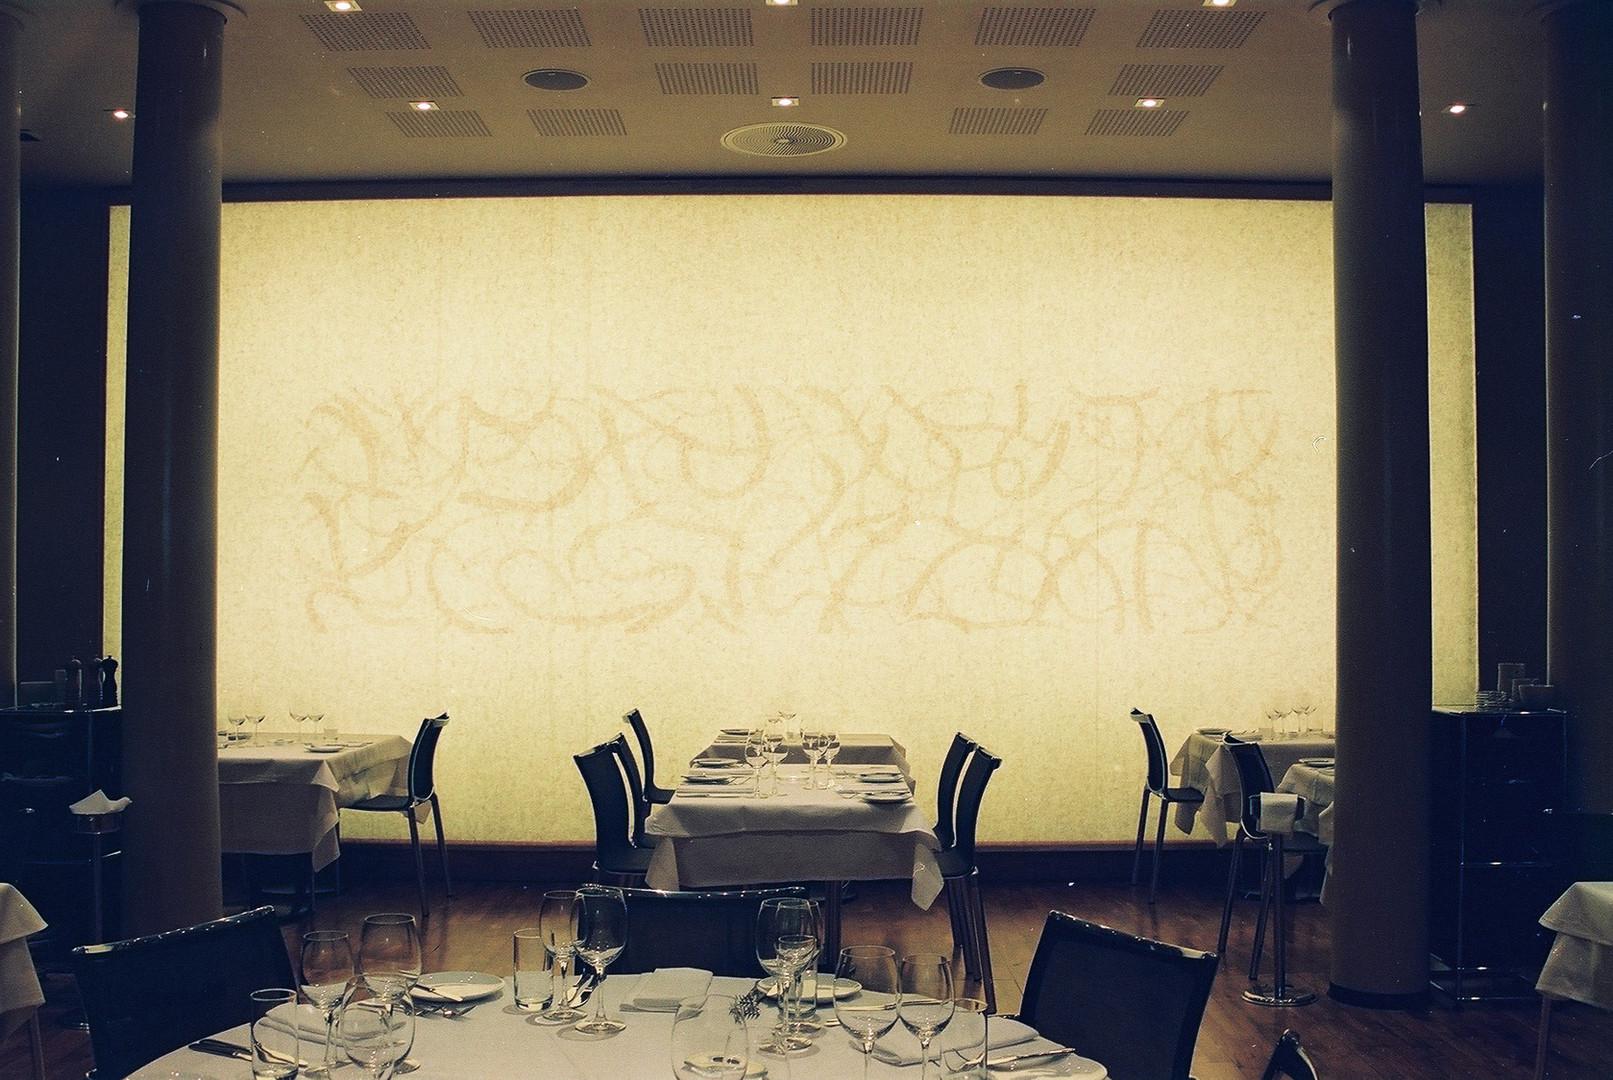 Restaurant Sans commissioned by Snøhetta Architects